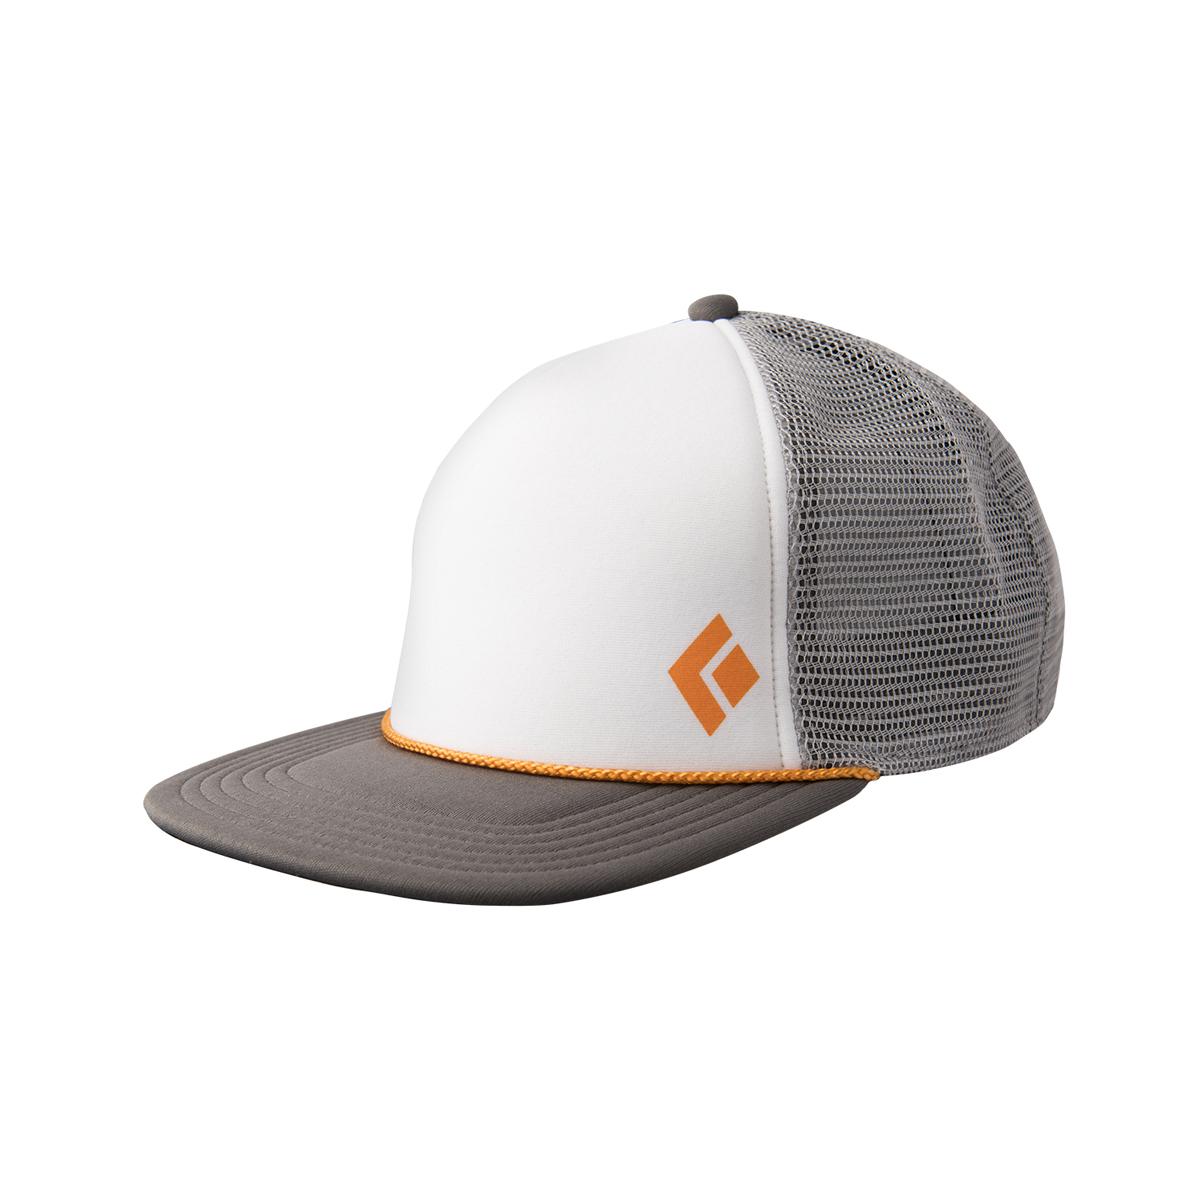 9aa596bc8c986 Black Diamond Flat Bill Trucker Hat | Hats & Caps | EpicTV Shop